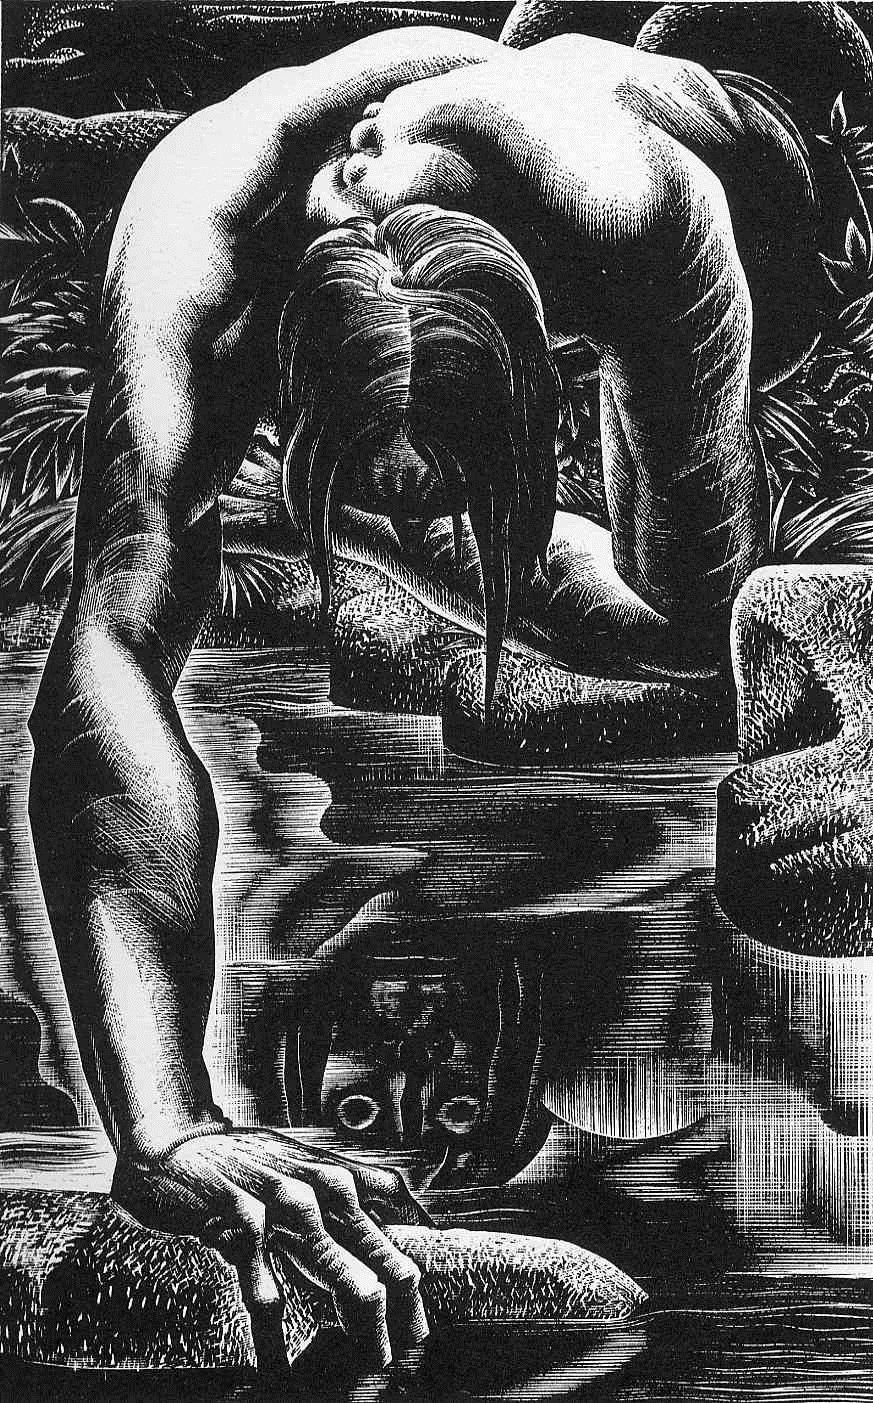 Frankenstein artwork.